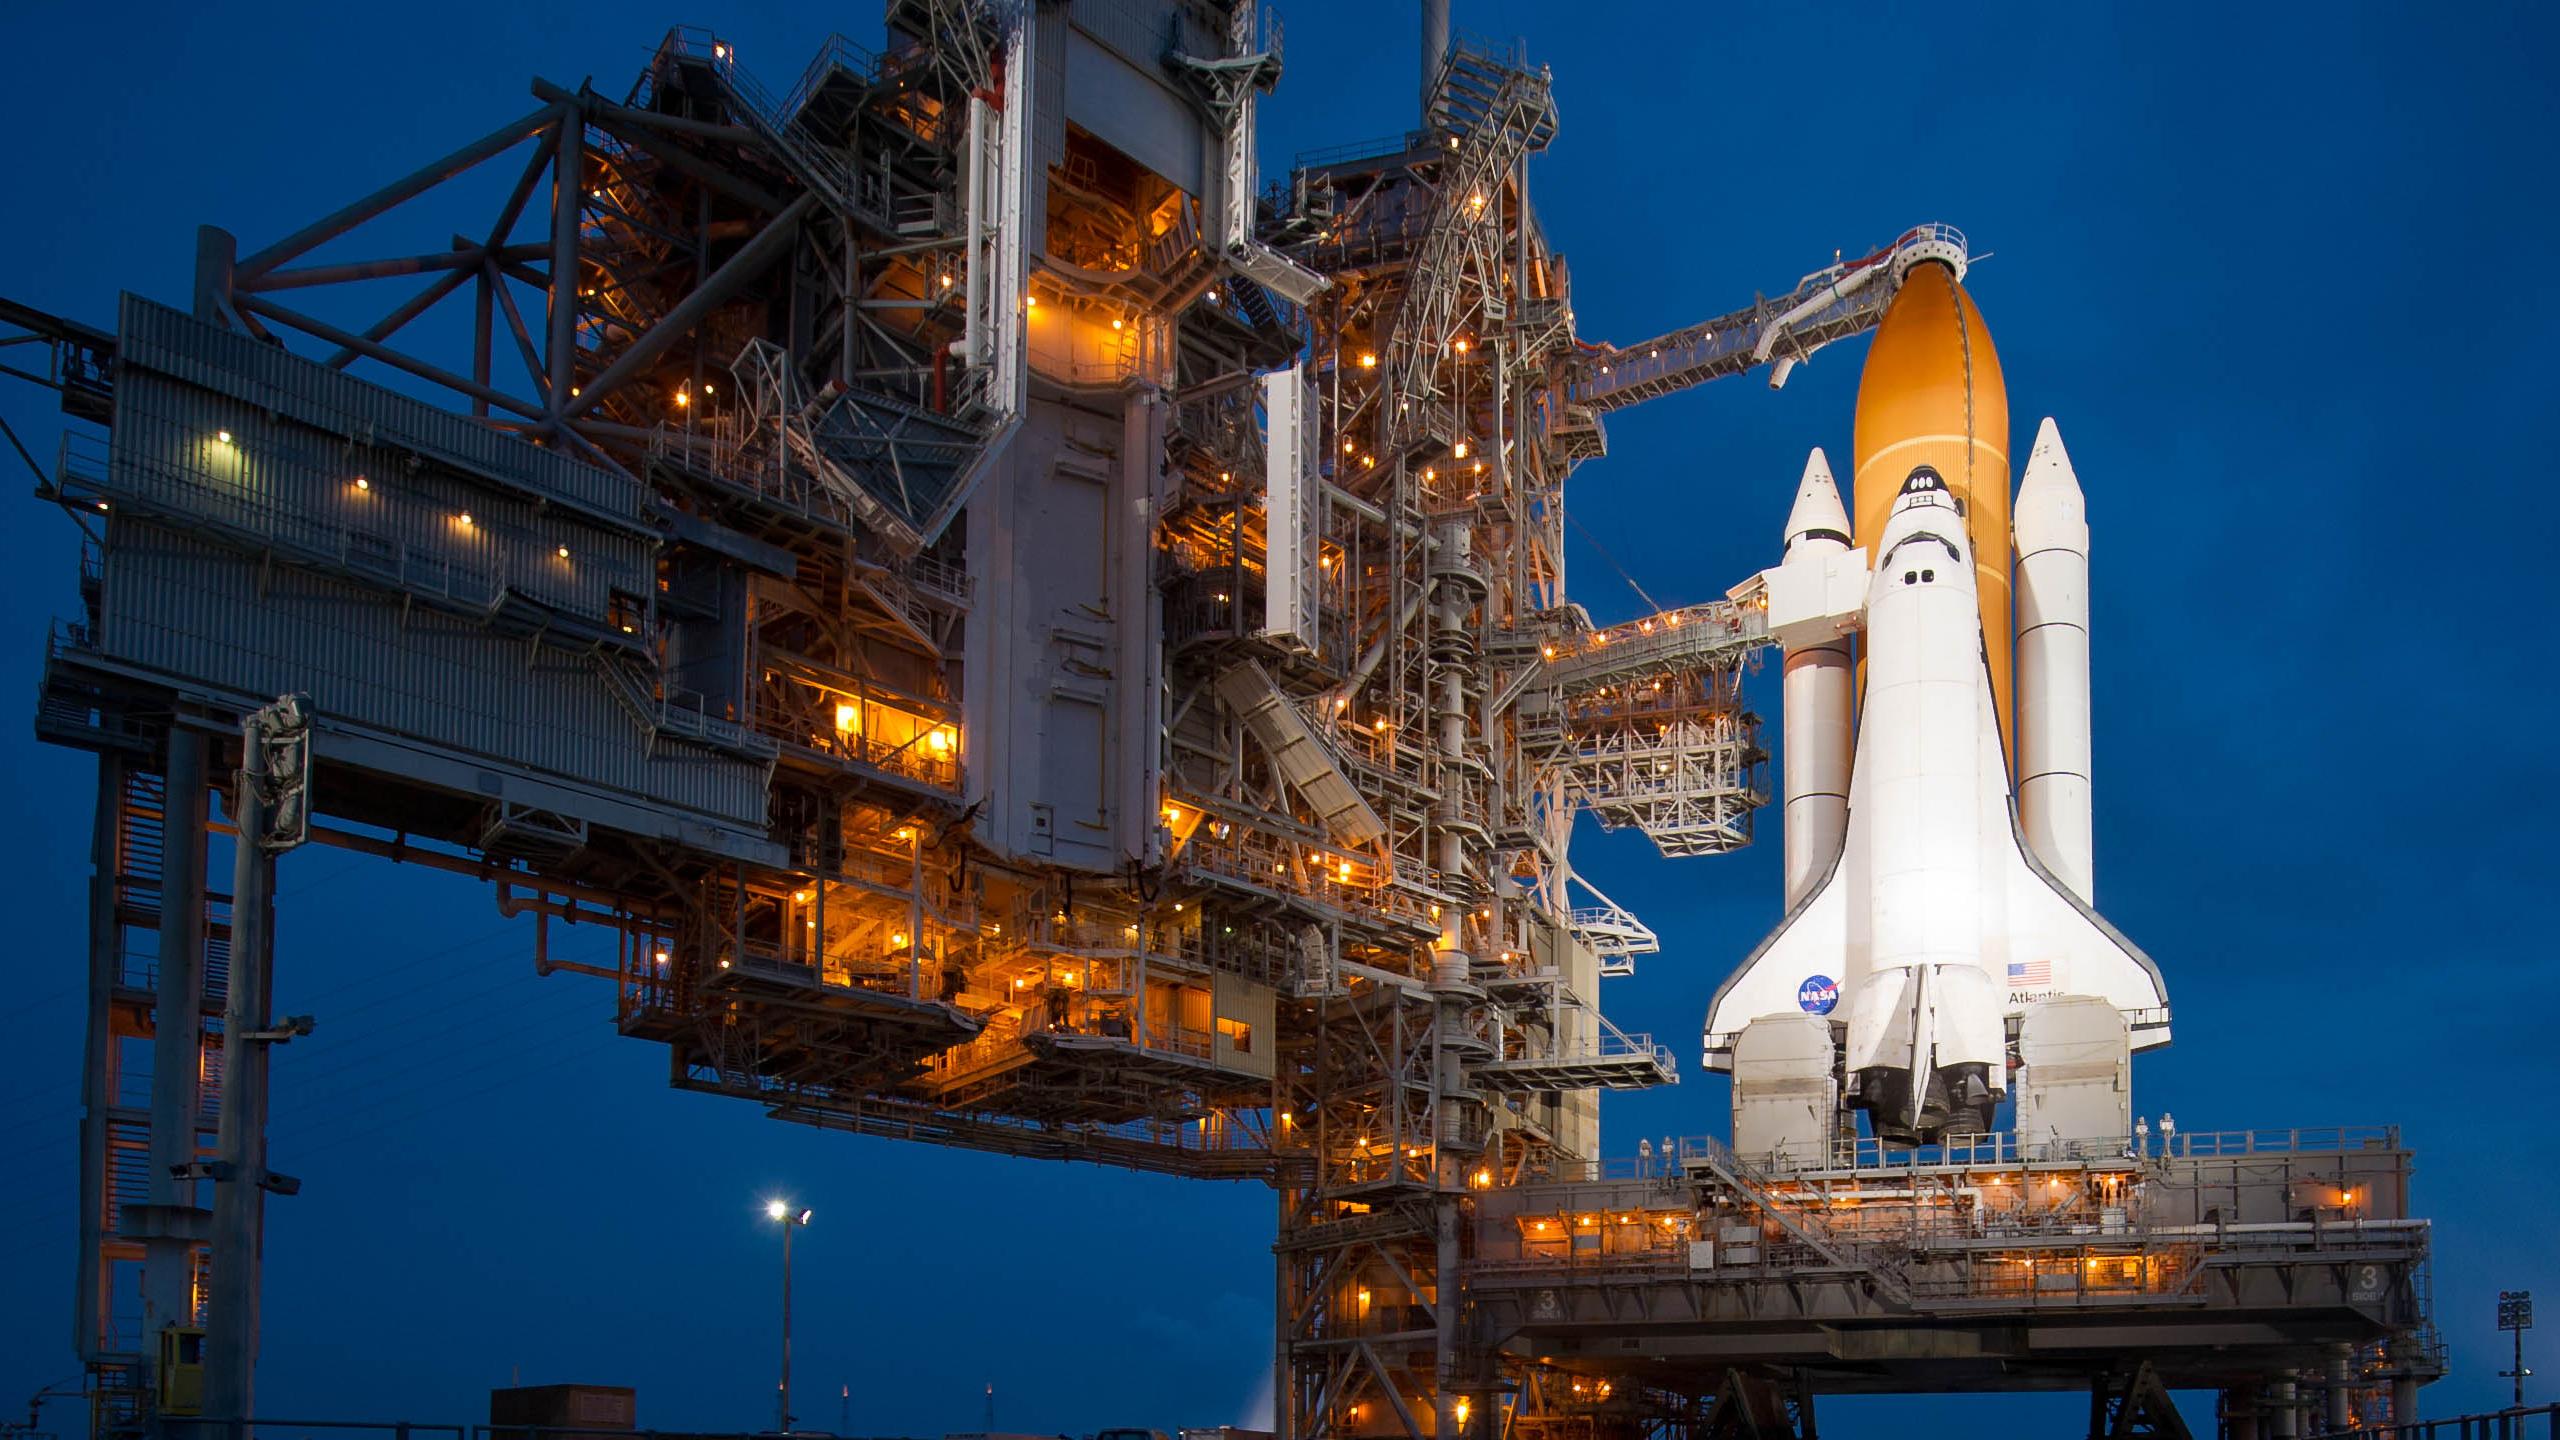 Space Shuttle Wallpaper 2560x1440 Space Shuttle NASA 2560x1440